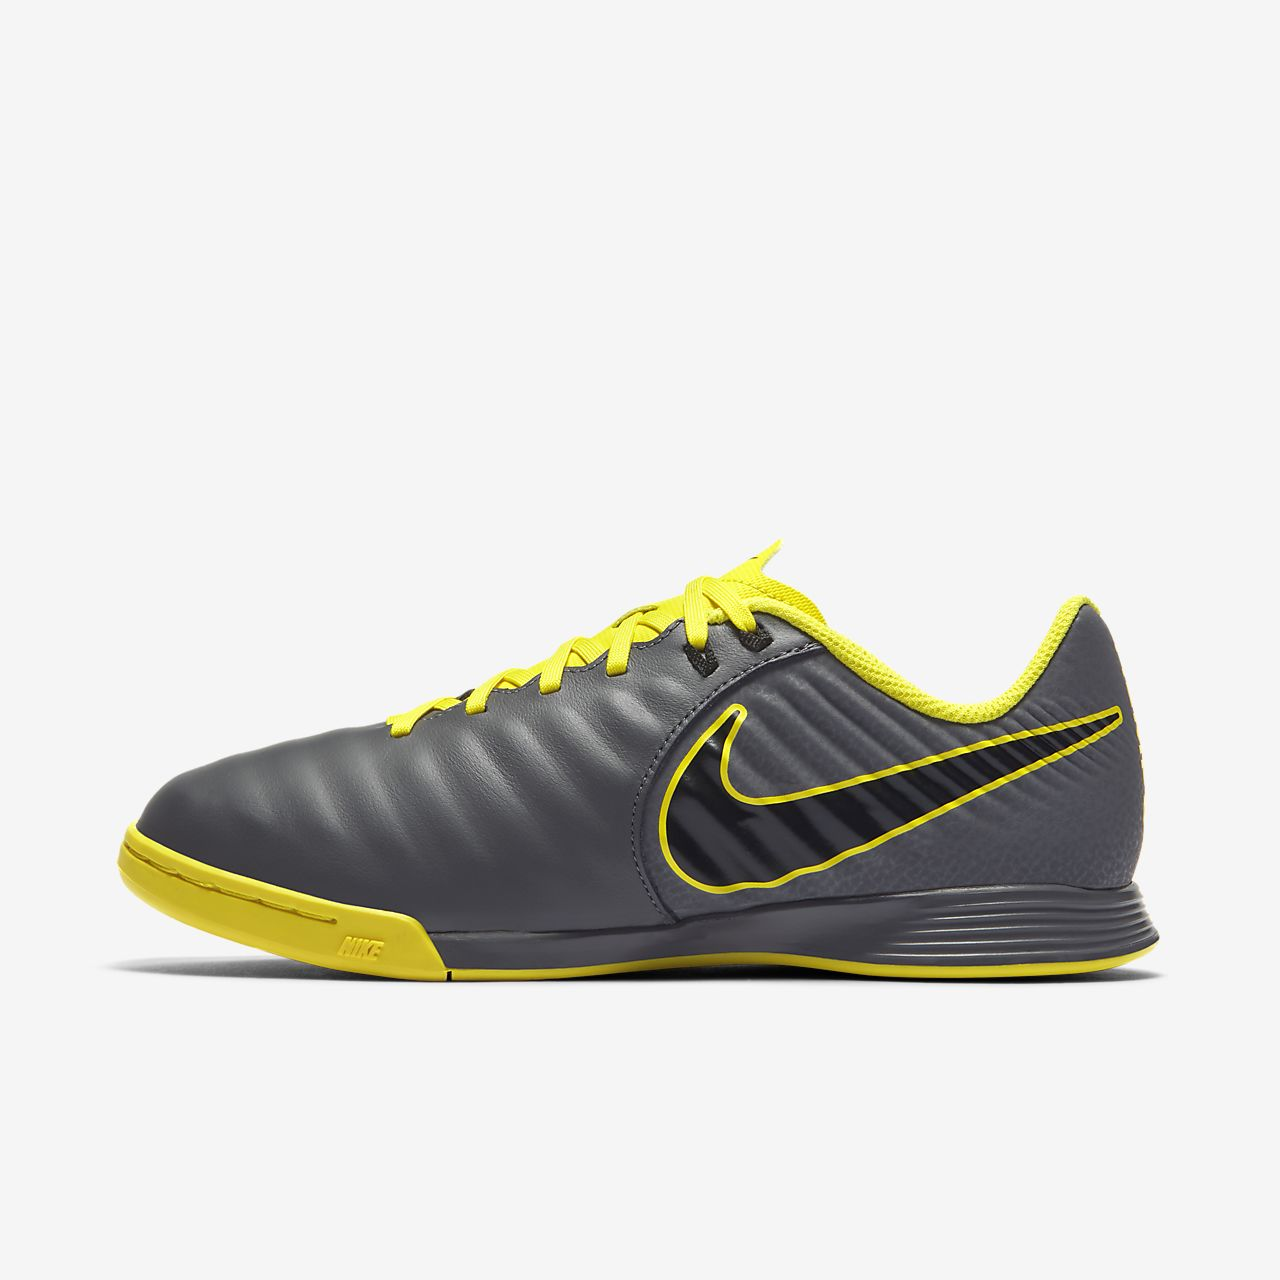 Nike Jr. Tiempo LegendX VII Academy IC Botas de fútbol sala - Niño ... 02a2dc9dfdfc0